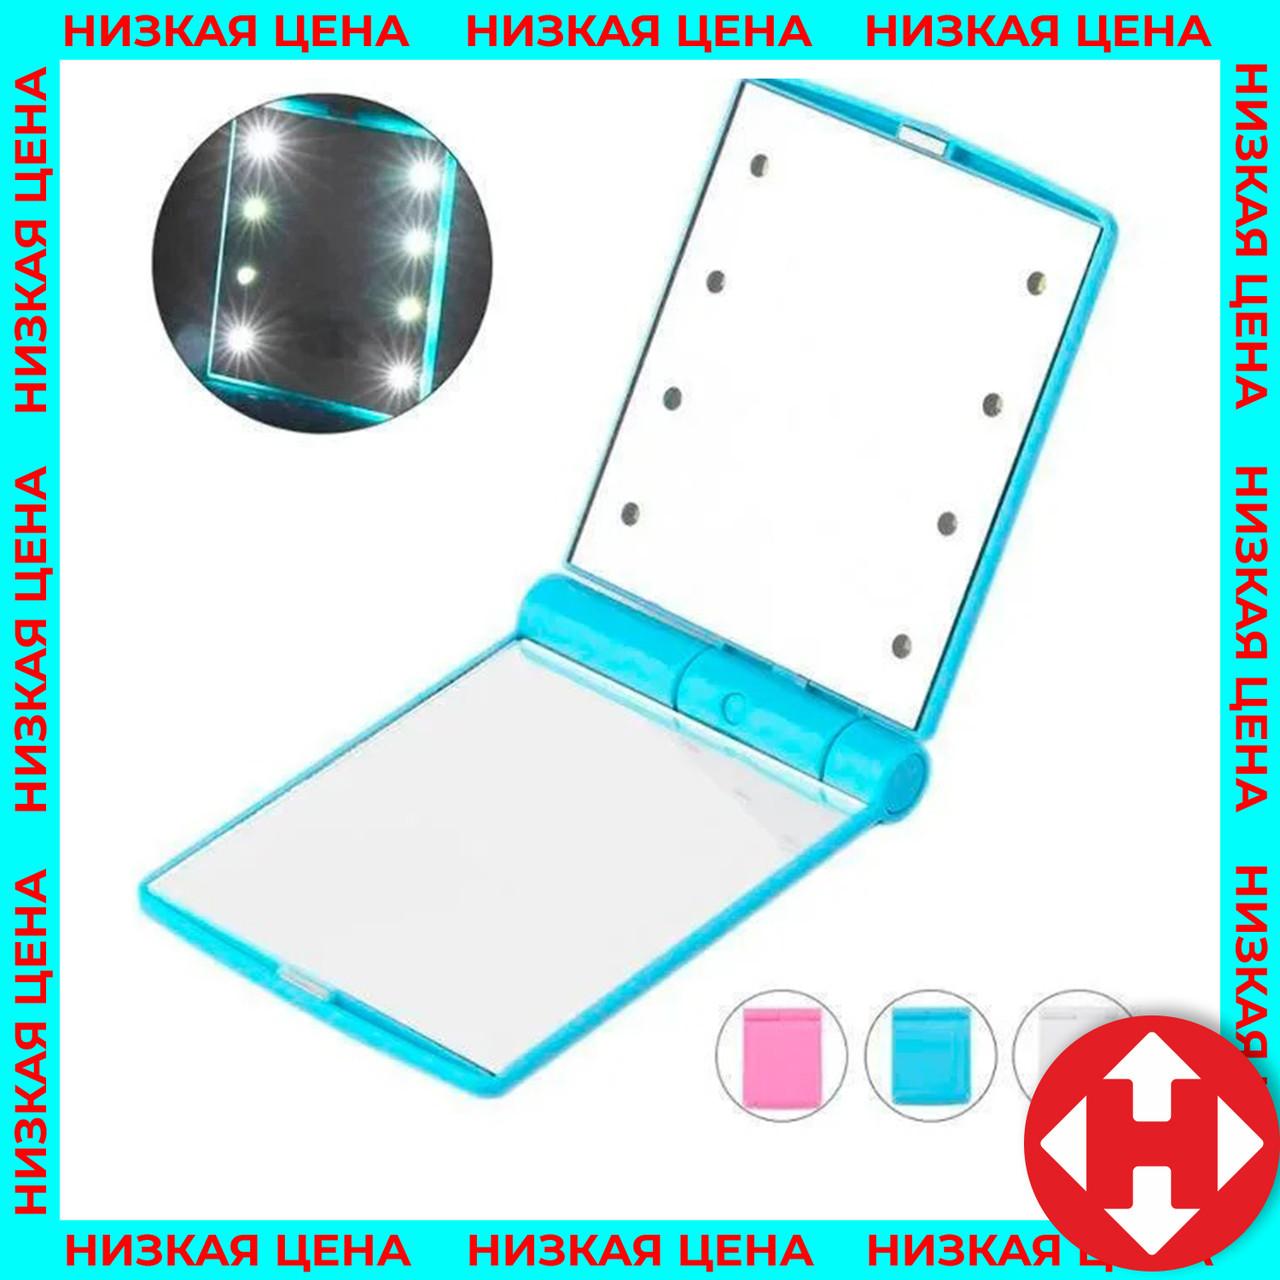 Распродажа! Карманное зеркало подсветкой Make-Up Mirror 8 LED Голубое зеркальце для макияжа в сумочку